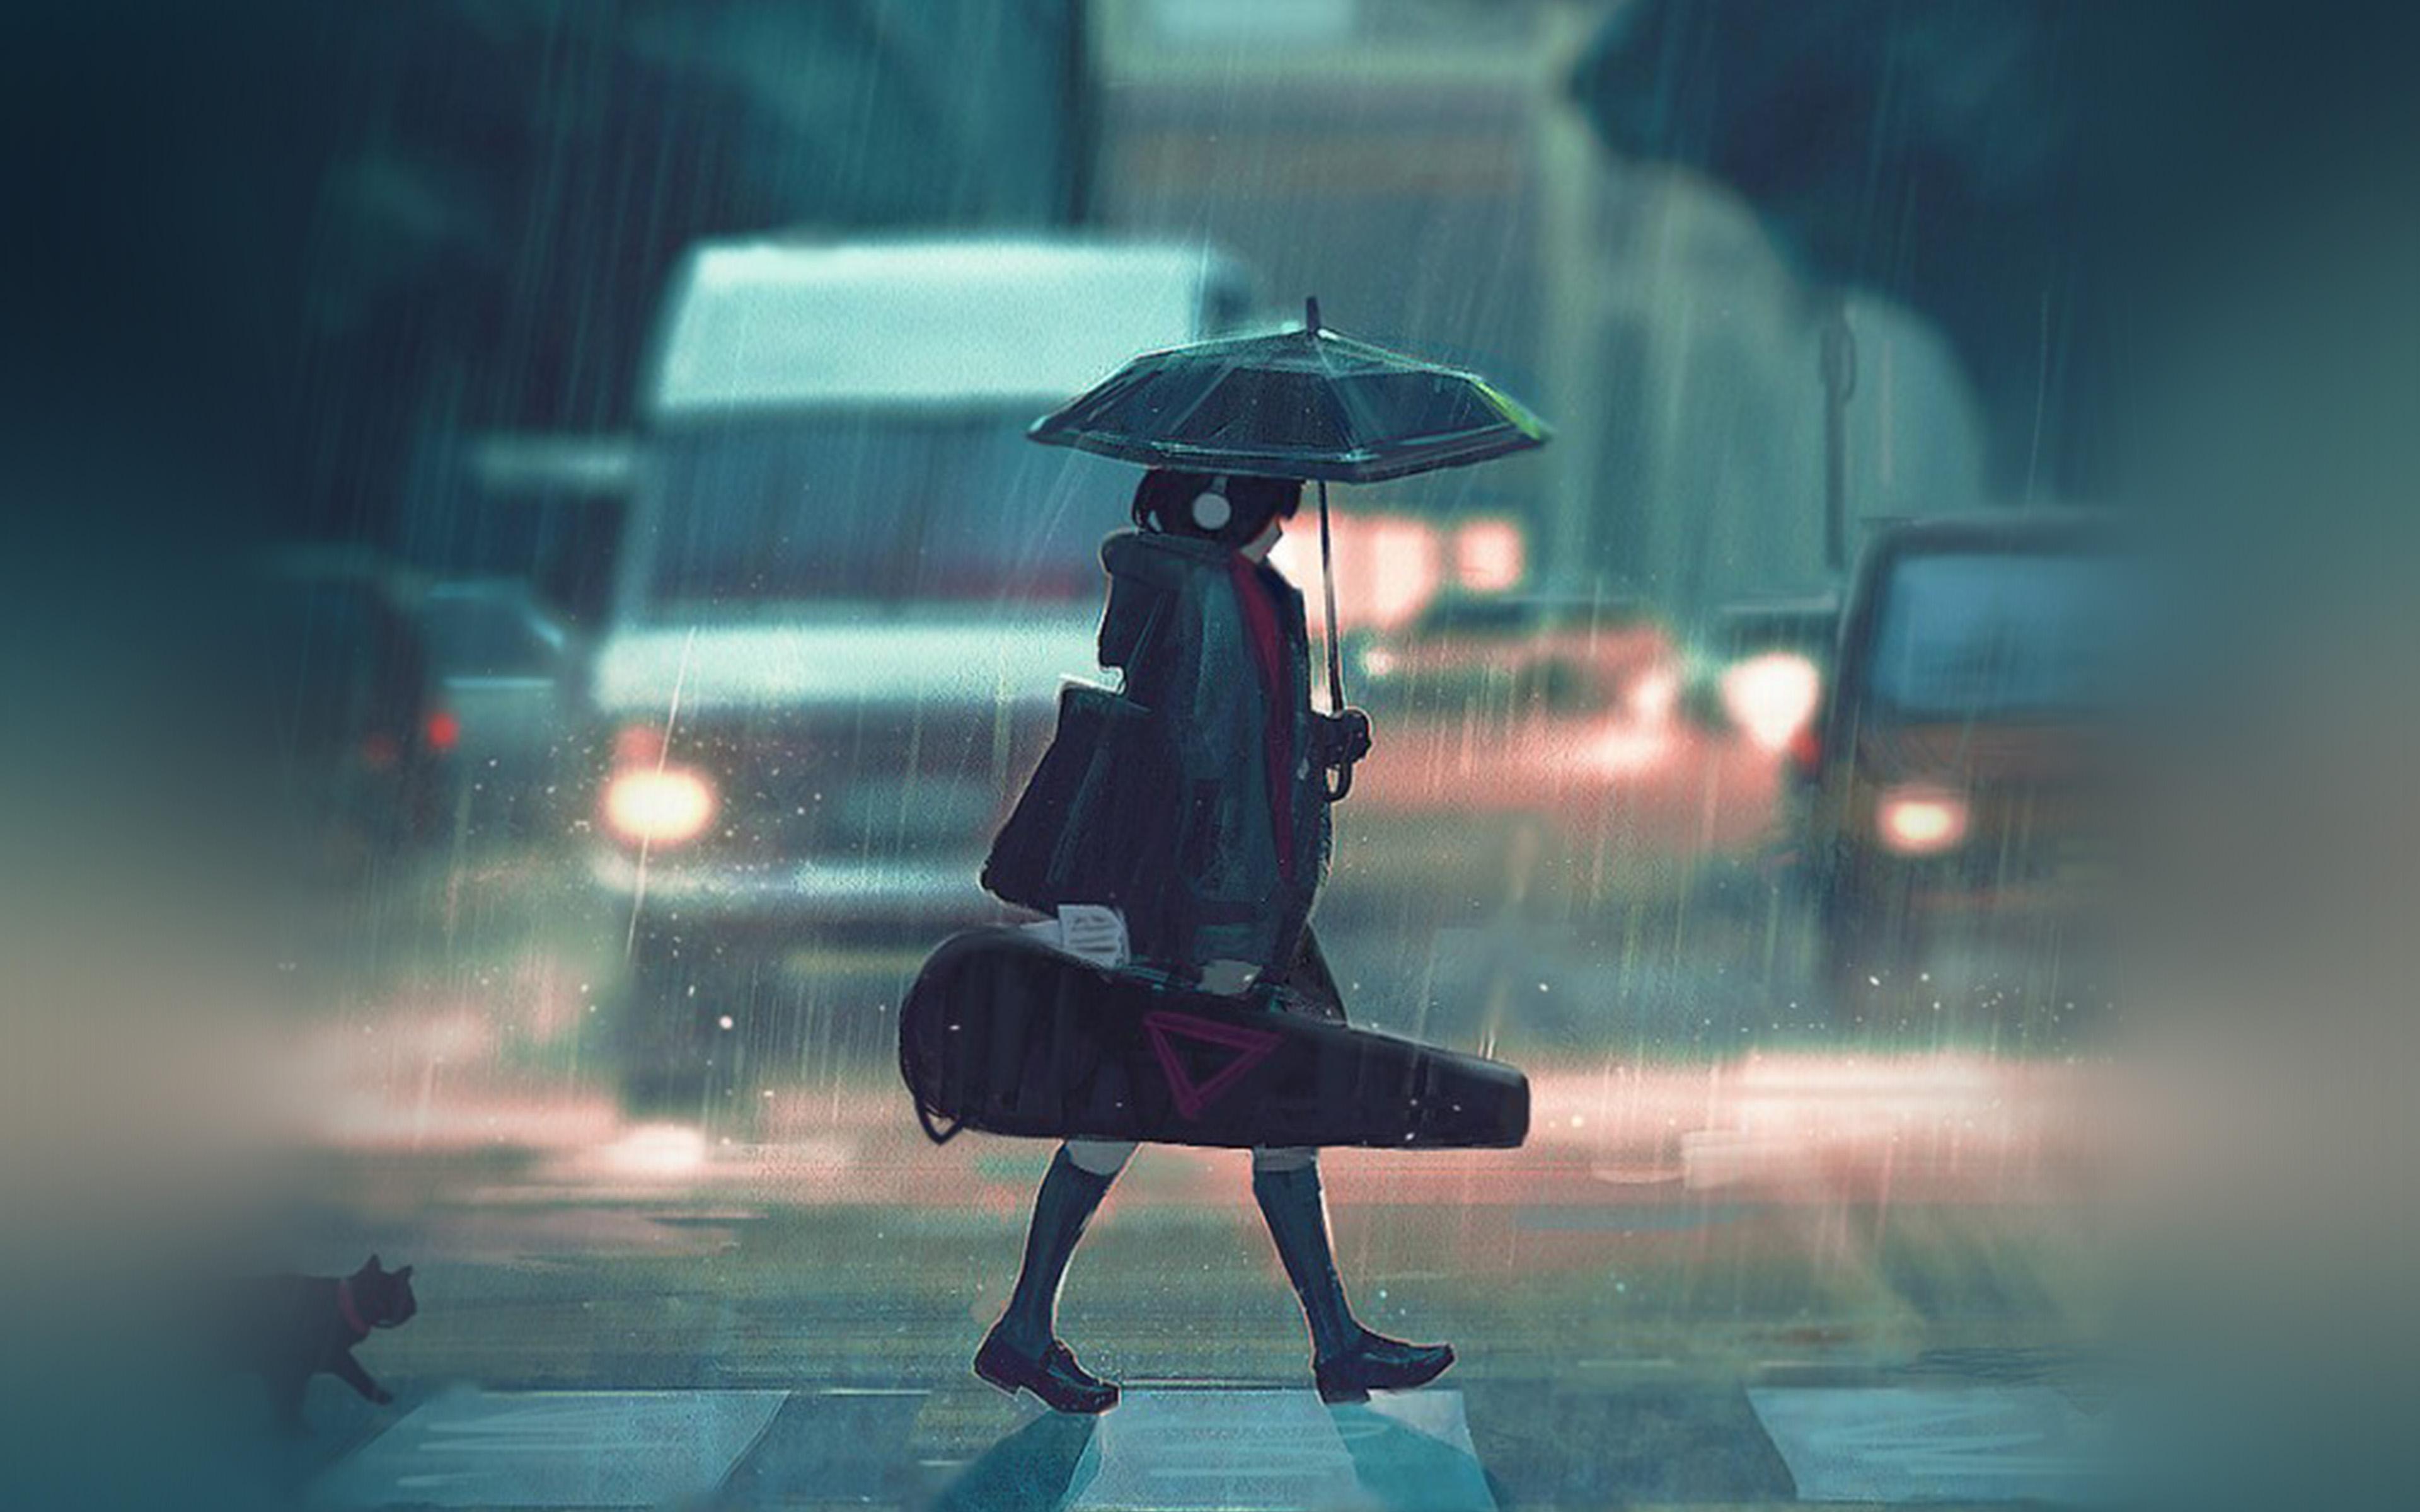 Bc89-rainy-day-anime-paint-girl-art-illustration-wallpaper